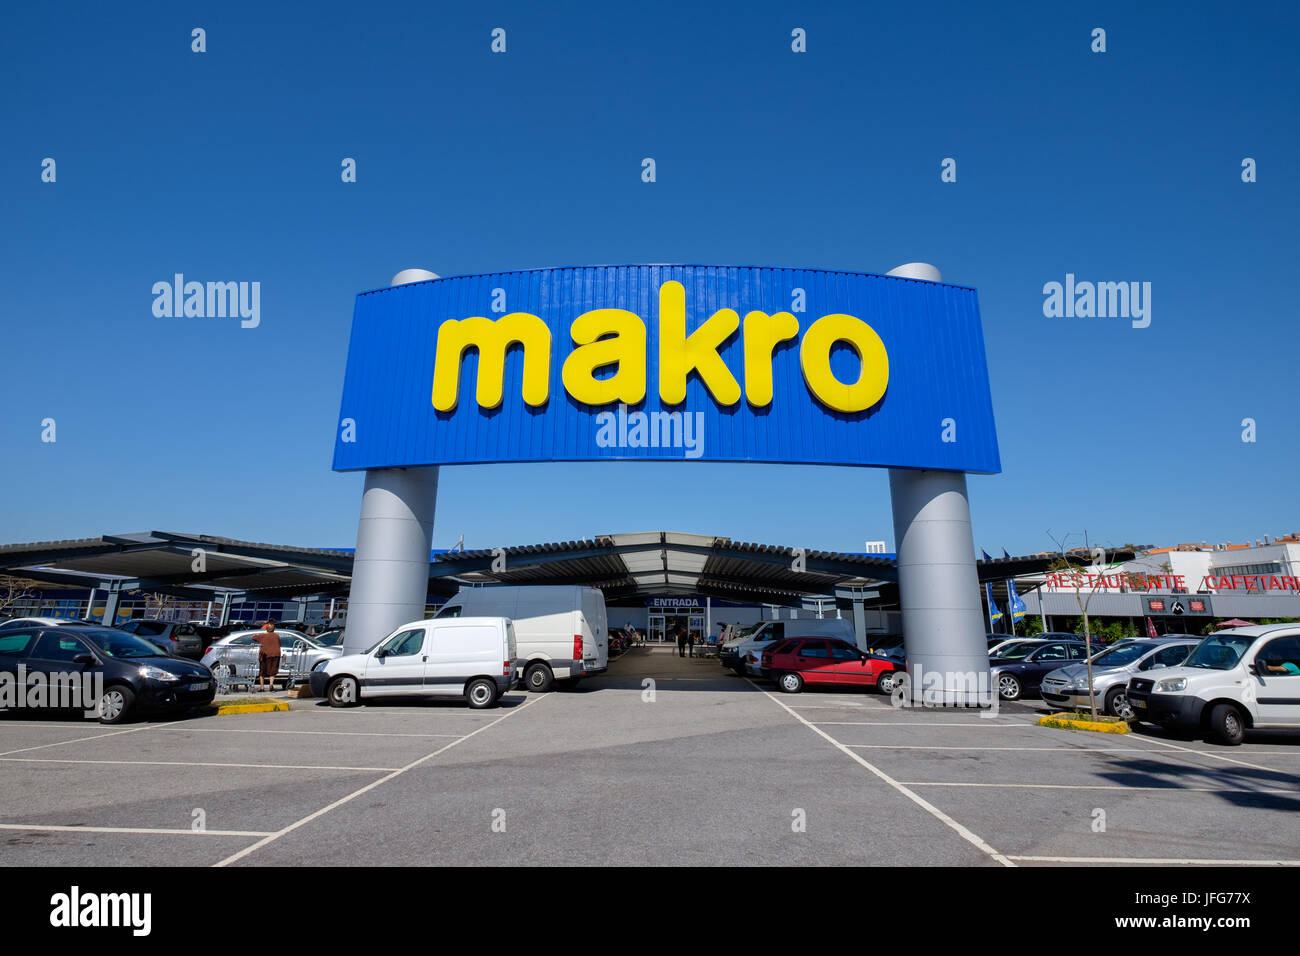 Makro retail store - Stock Image